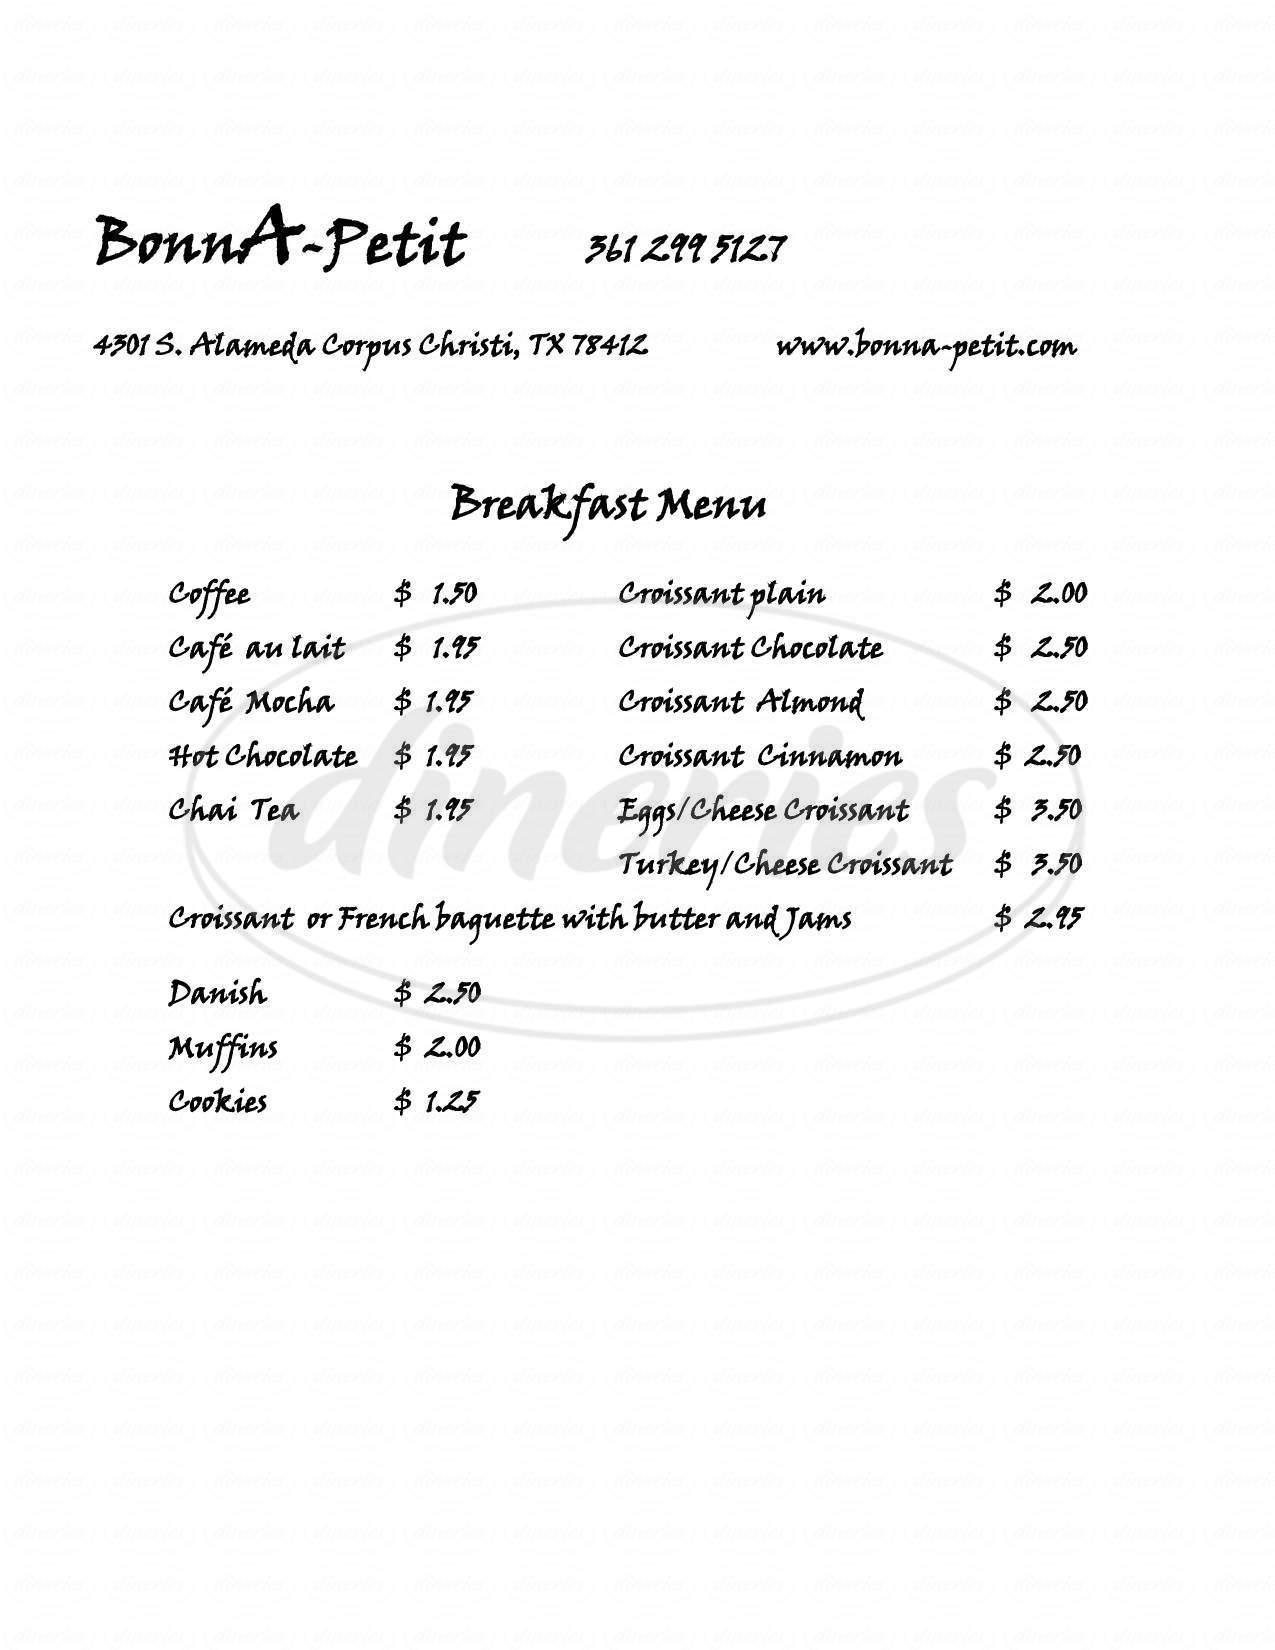 menu for Bonn Apetit